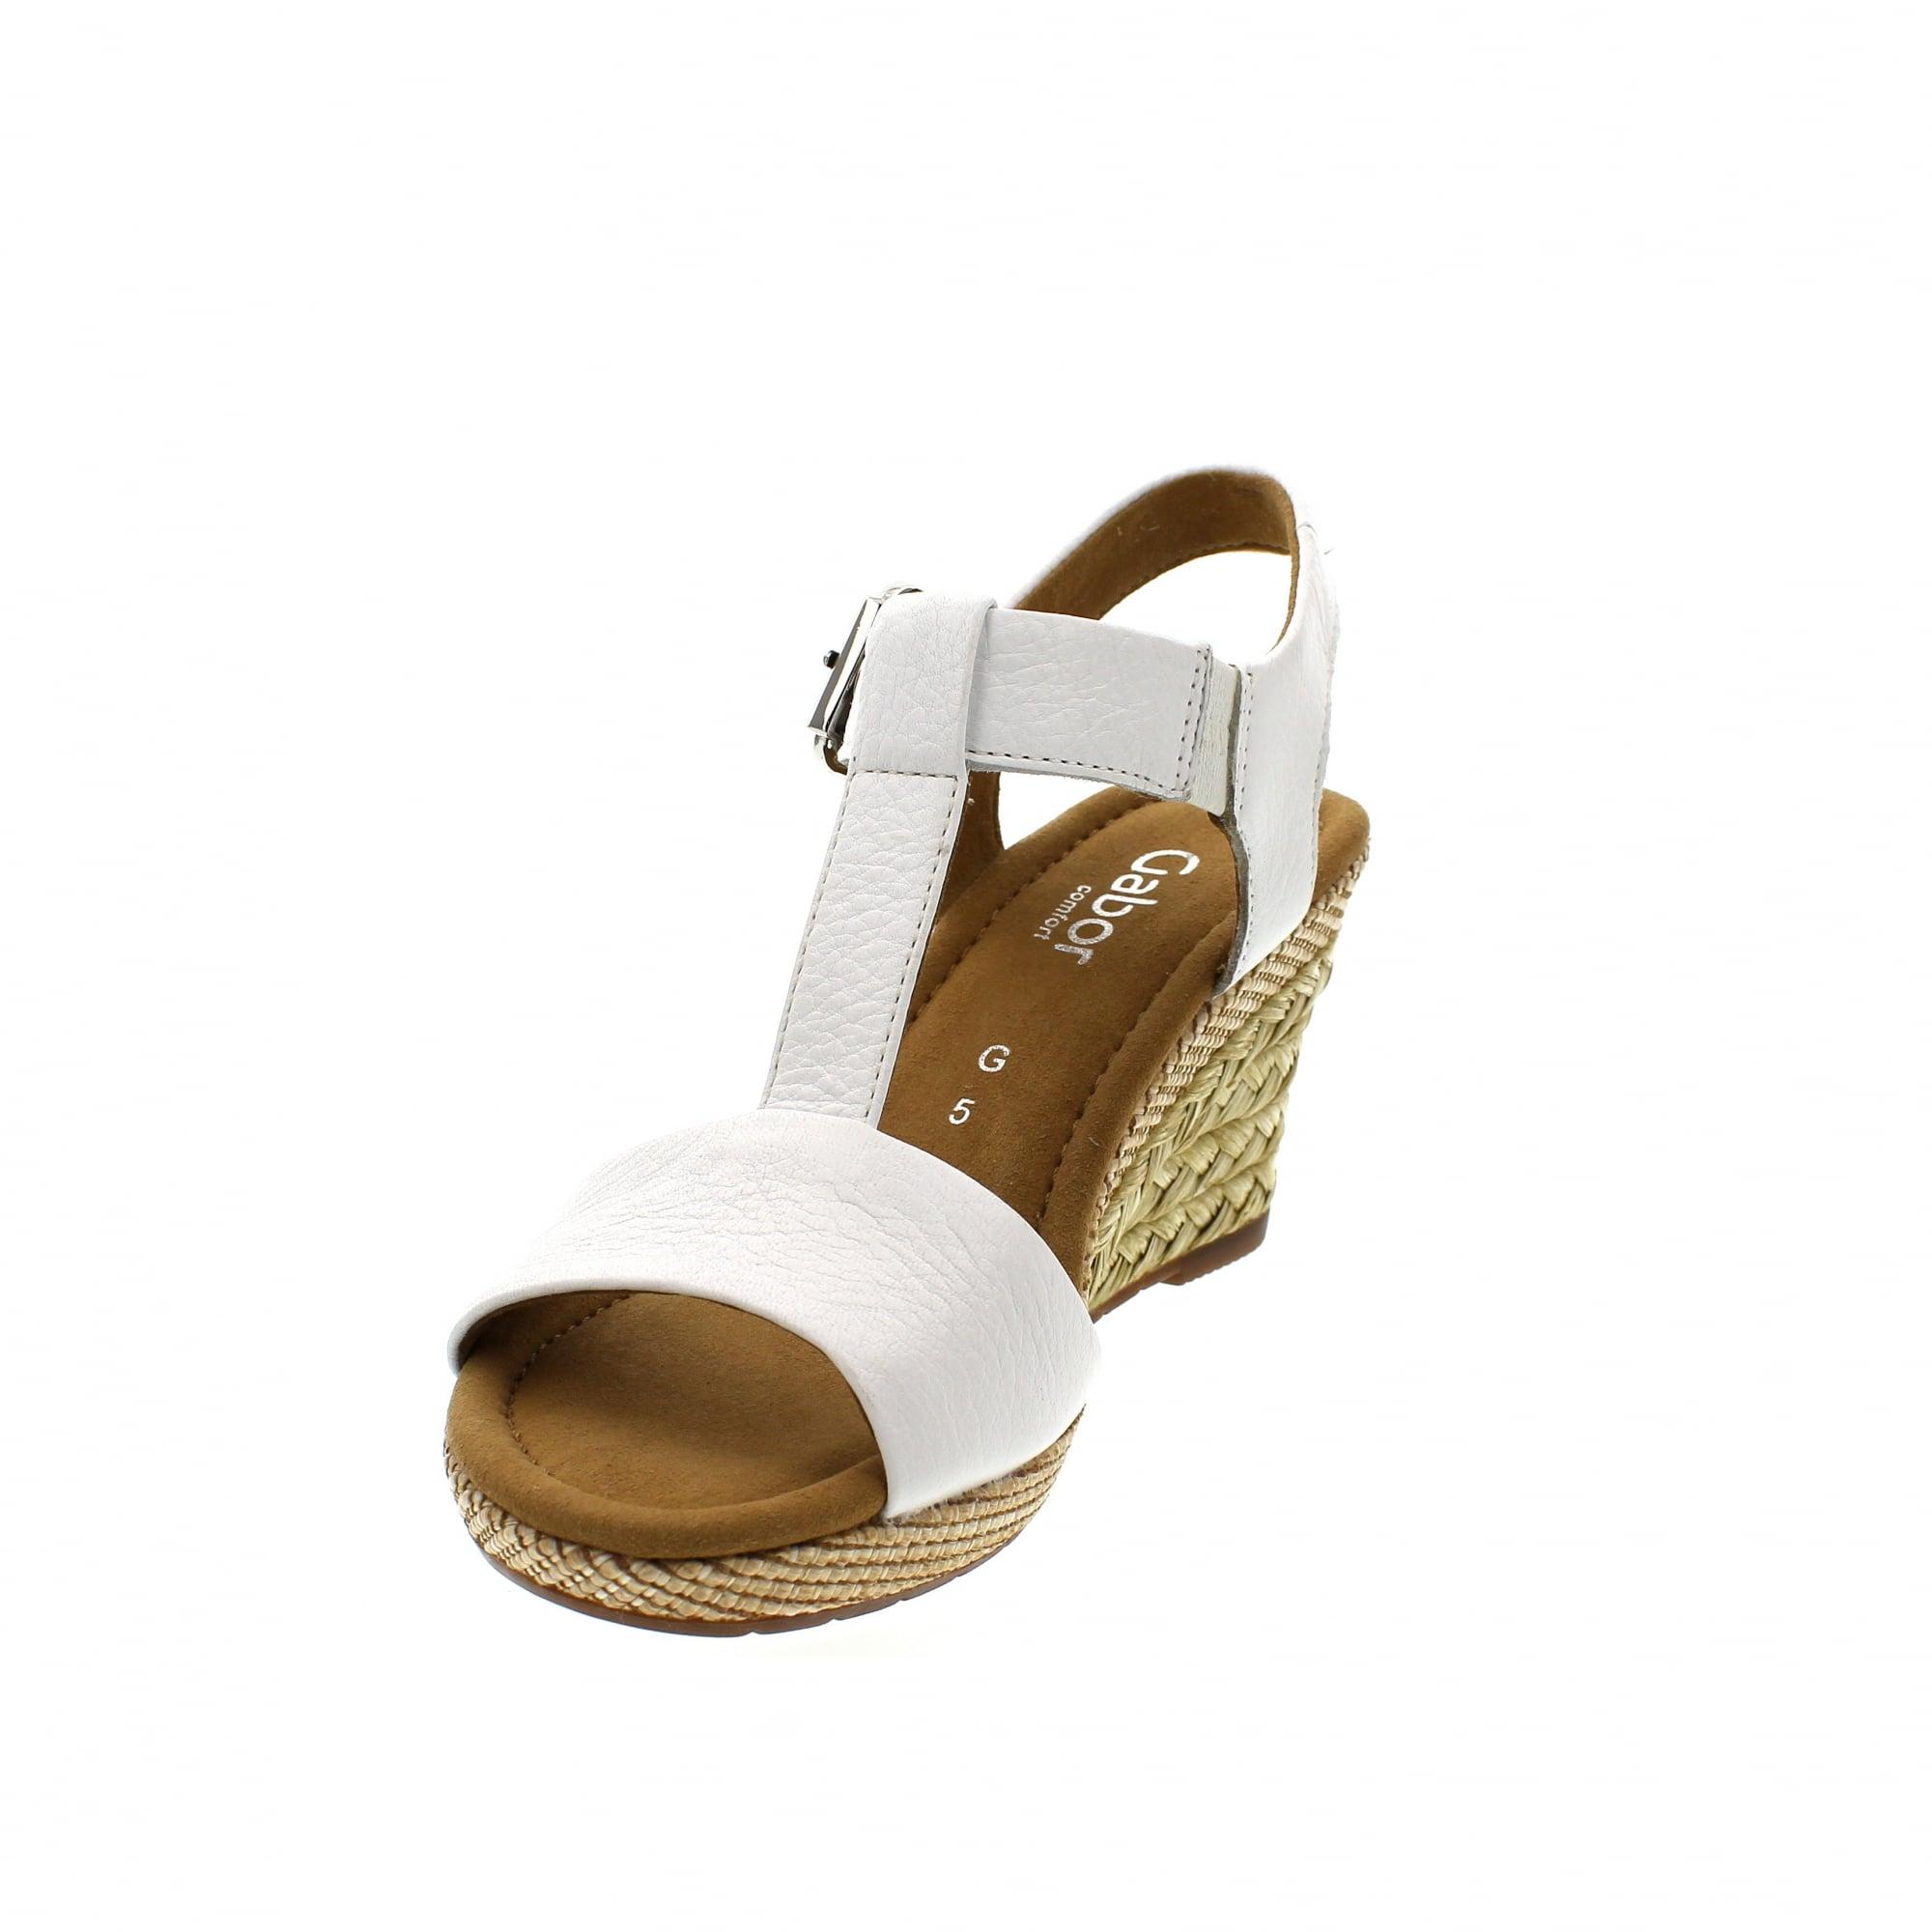 f1ce778c9 Gabor Karen 22-824-50 White Leather Womens Sandals